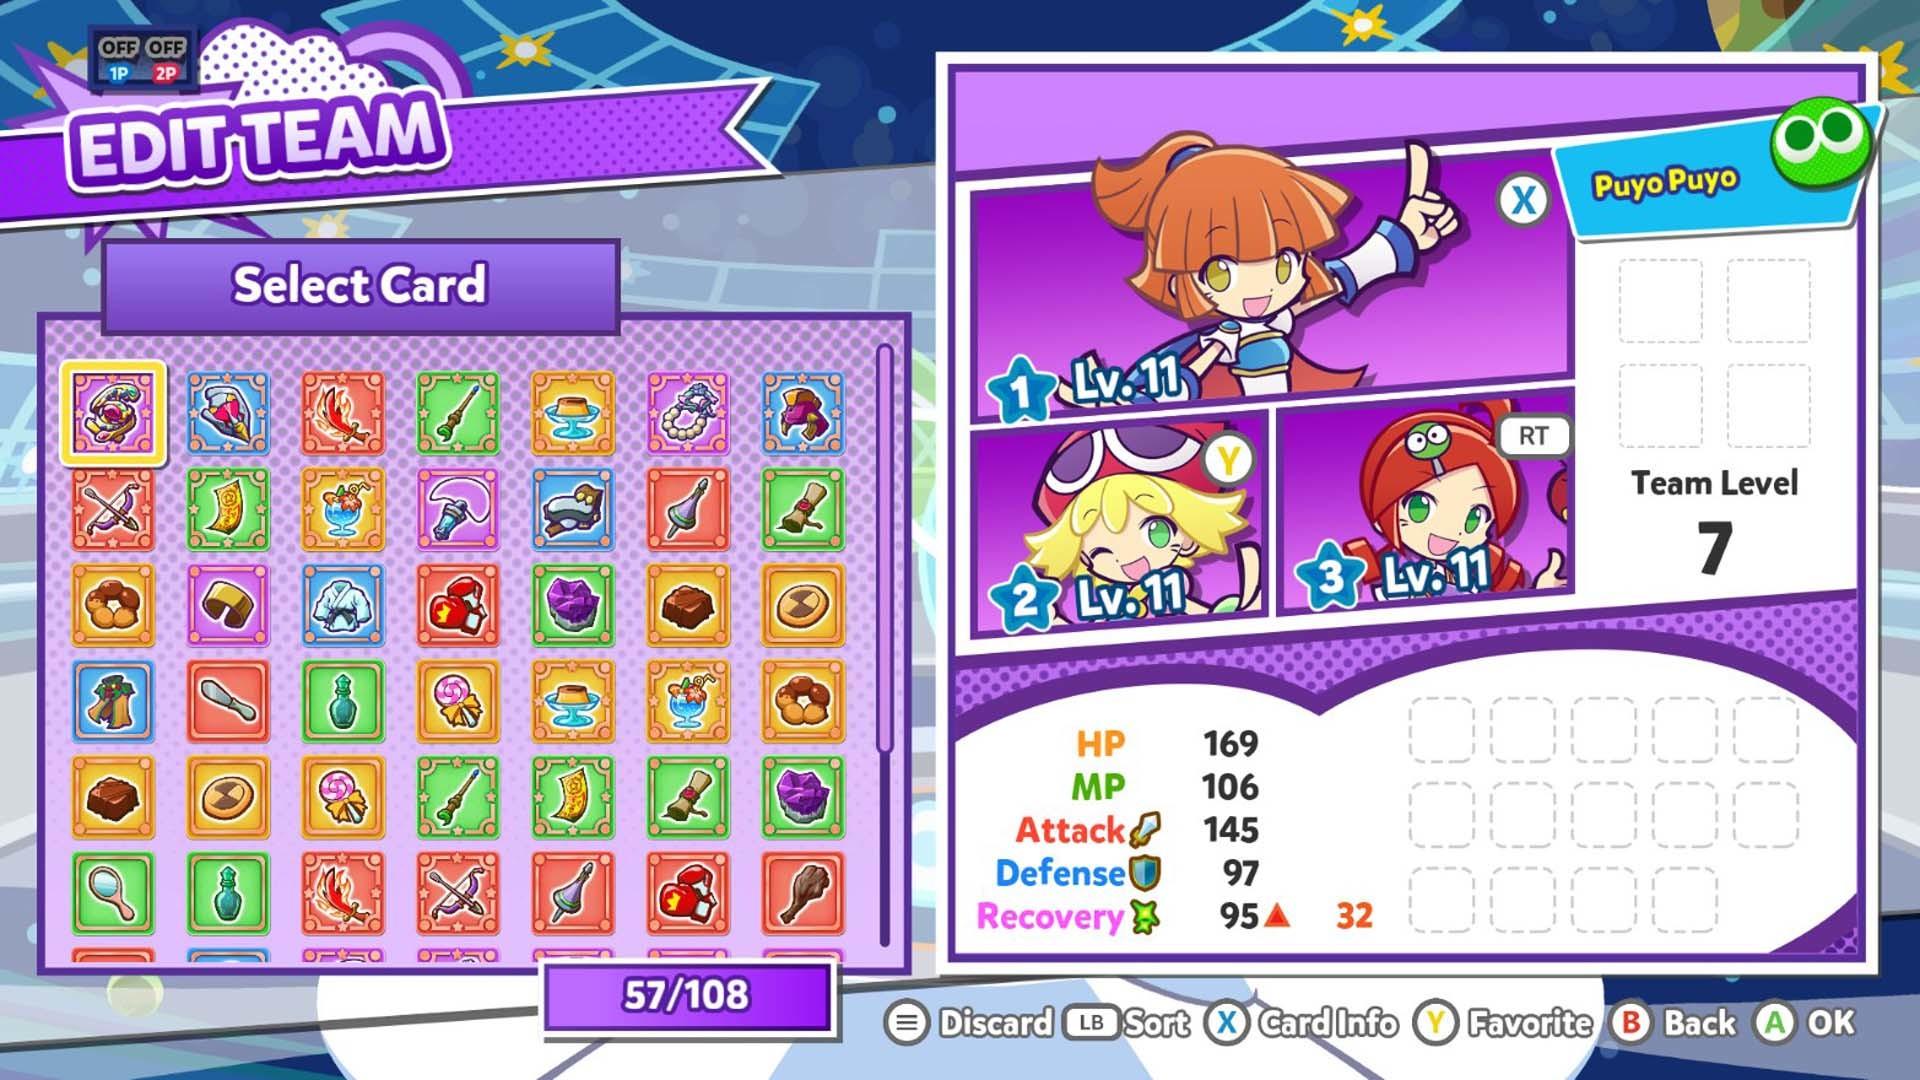 puyopuyo-tetris-2-pc-screenshot-3